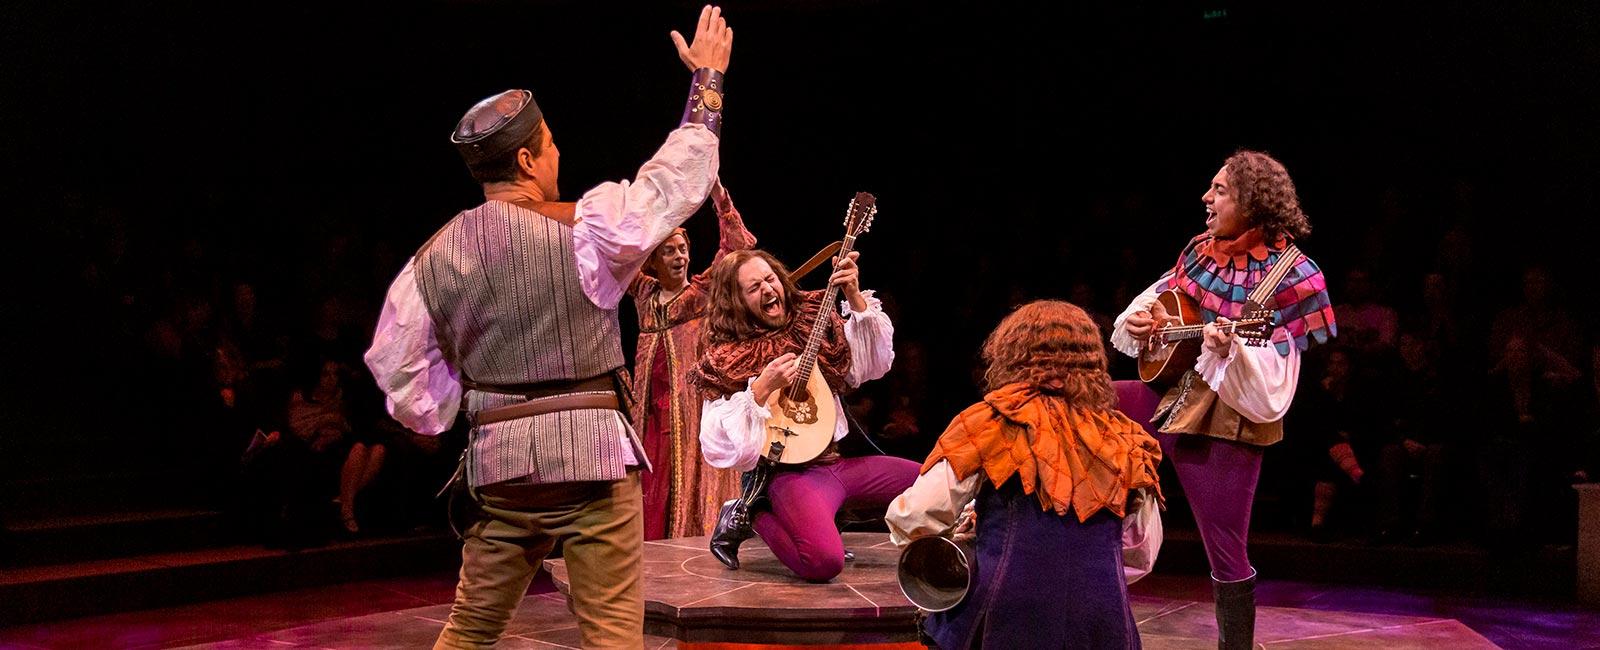 The Company of Twelfth Night_Photo by Adams VisCom